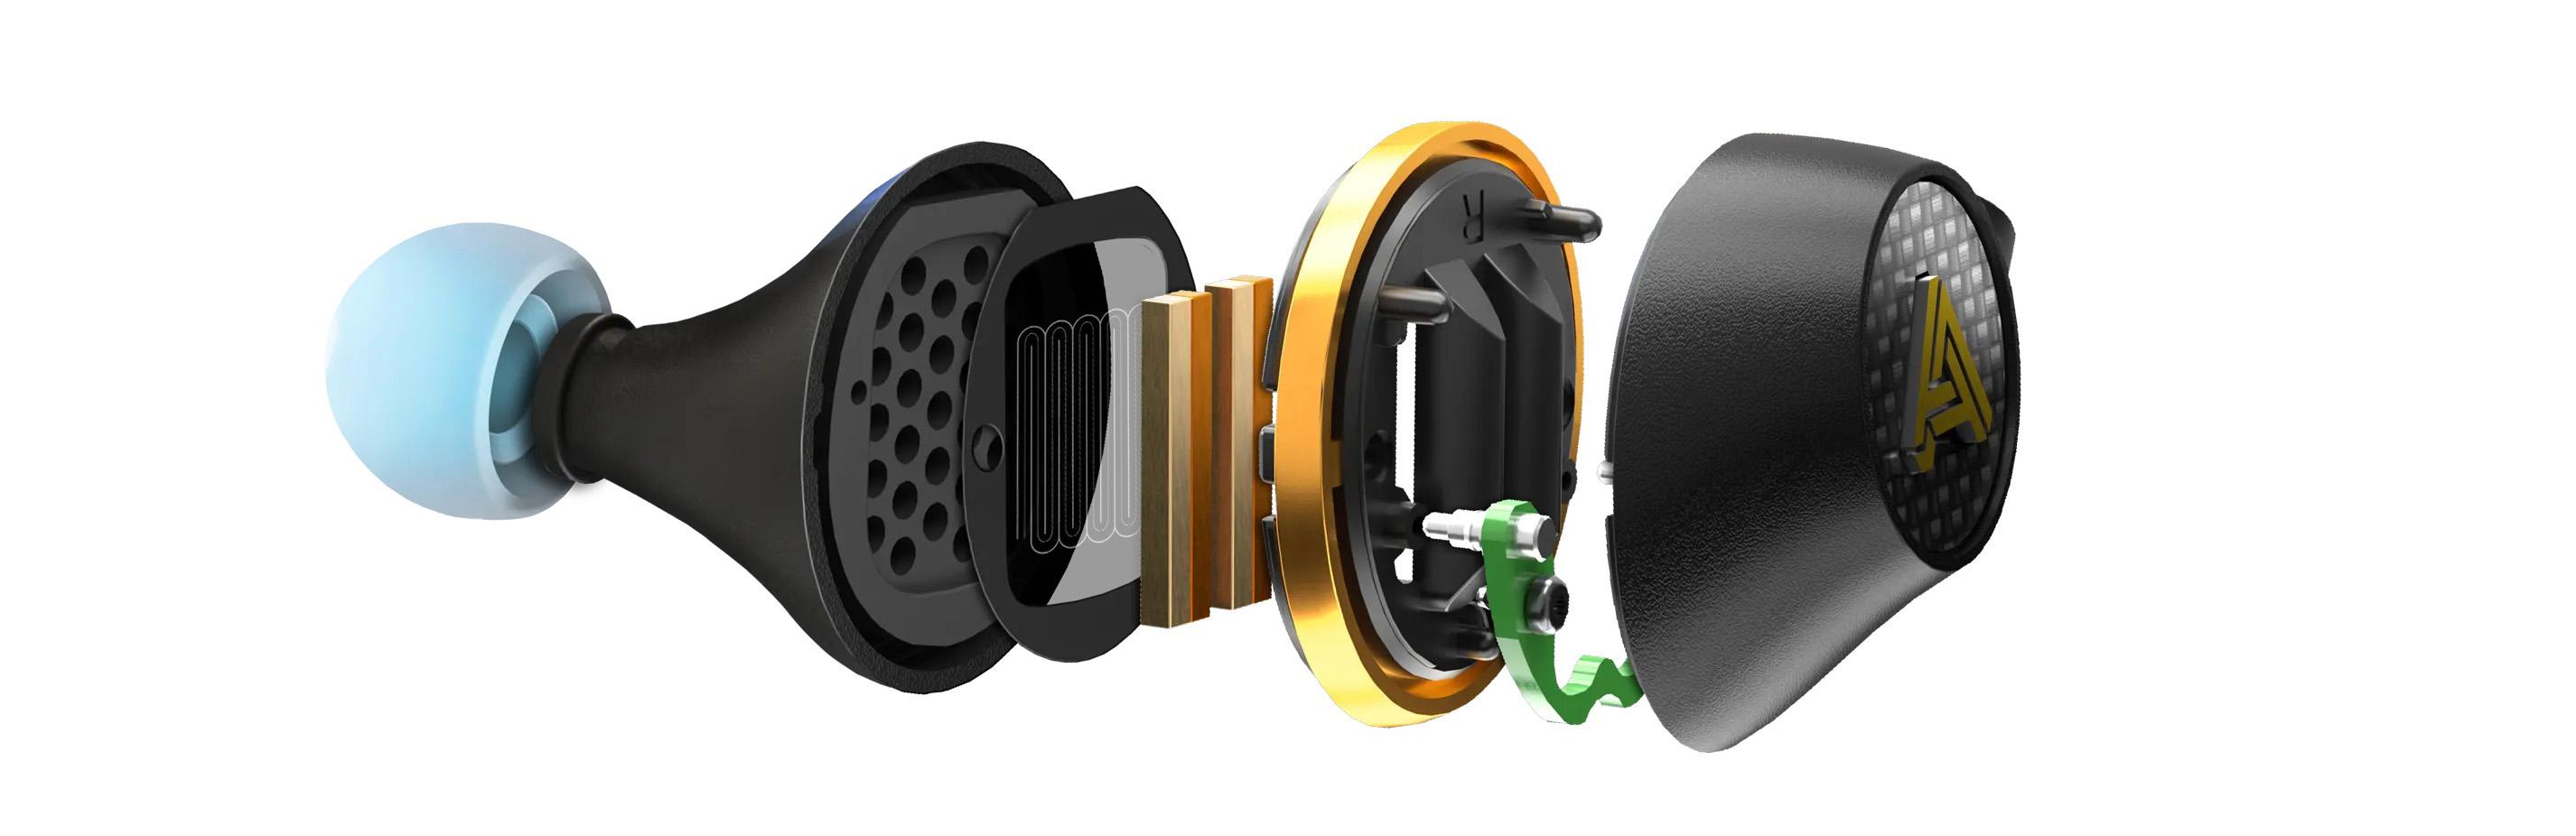 Planar Magnetic Driver Technology